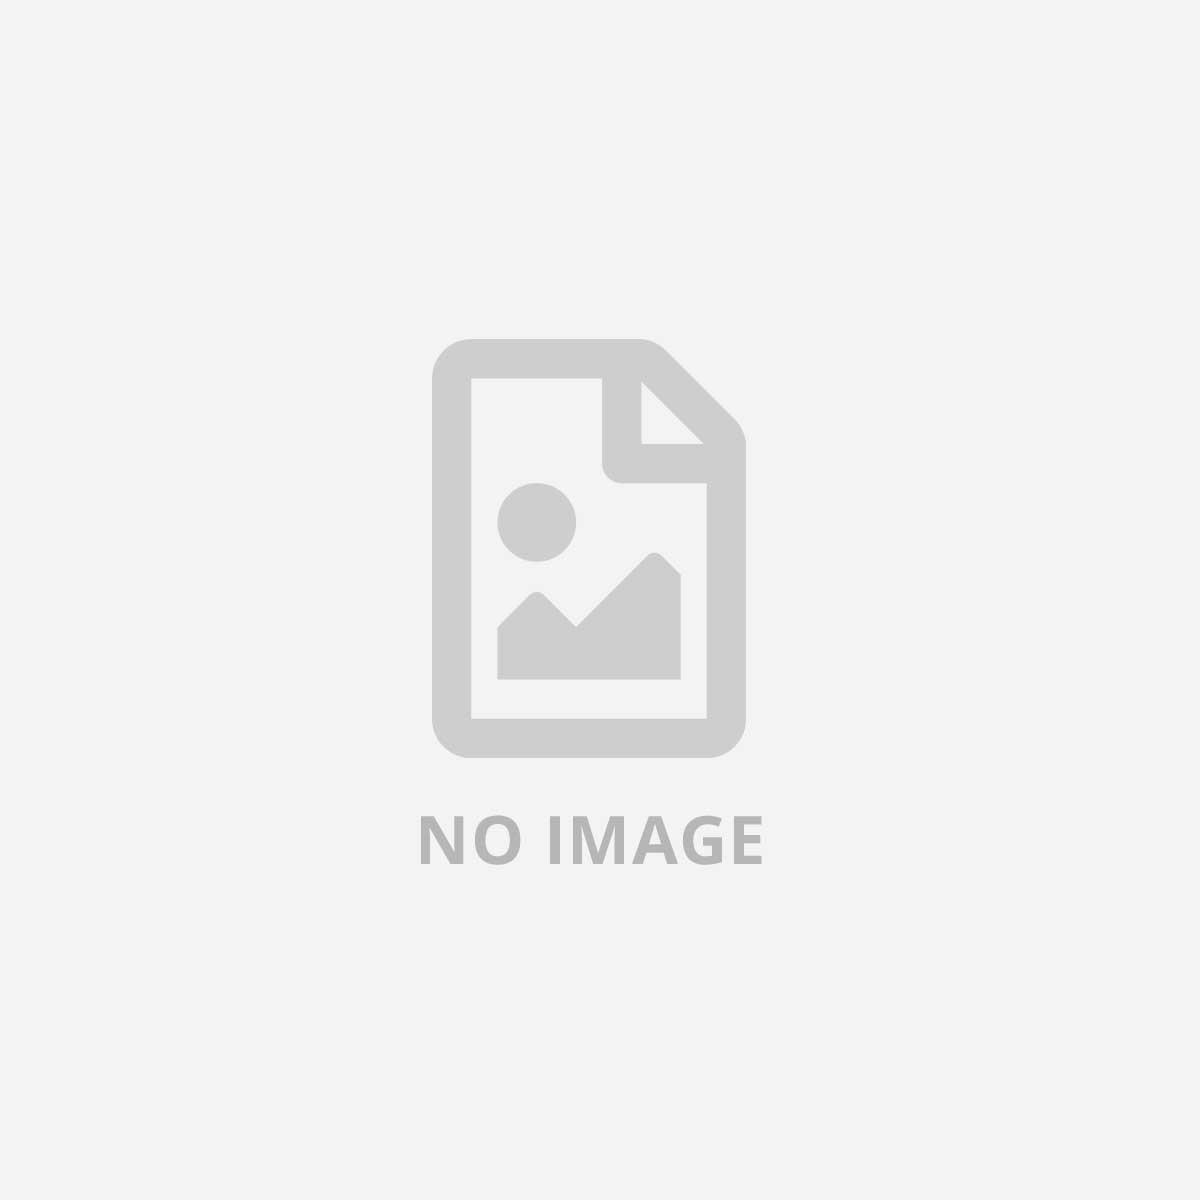 CONCEPTRONIC HD WIRELESS IP CAM 720P PAN TILT